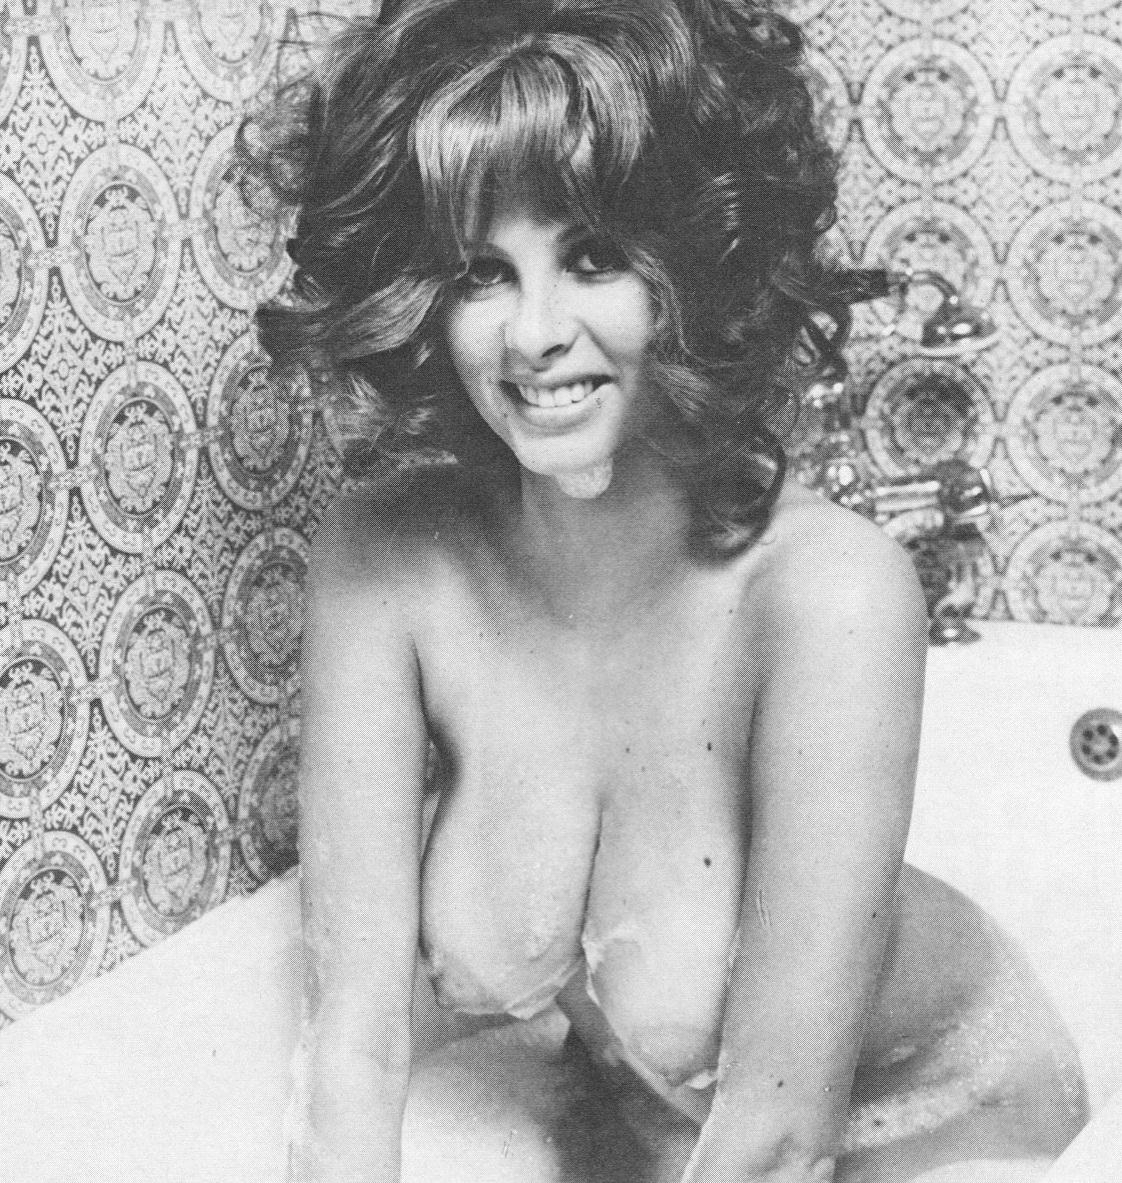 naked arlene dahl nude sex porn images gallery-31578 | my